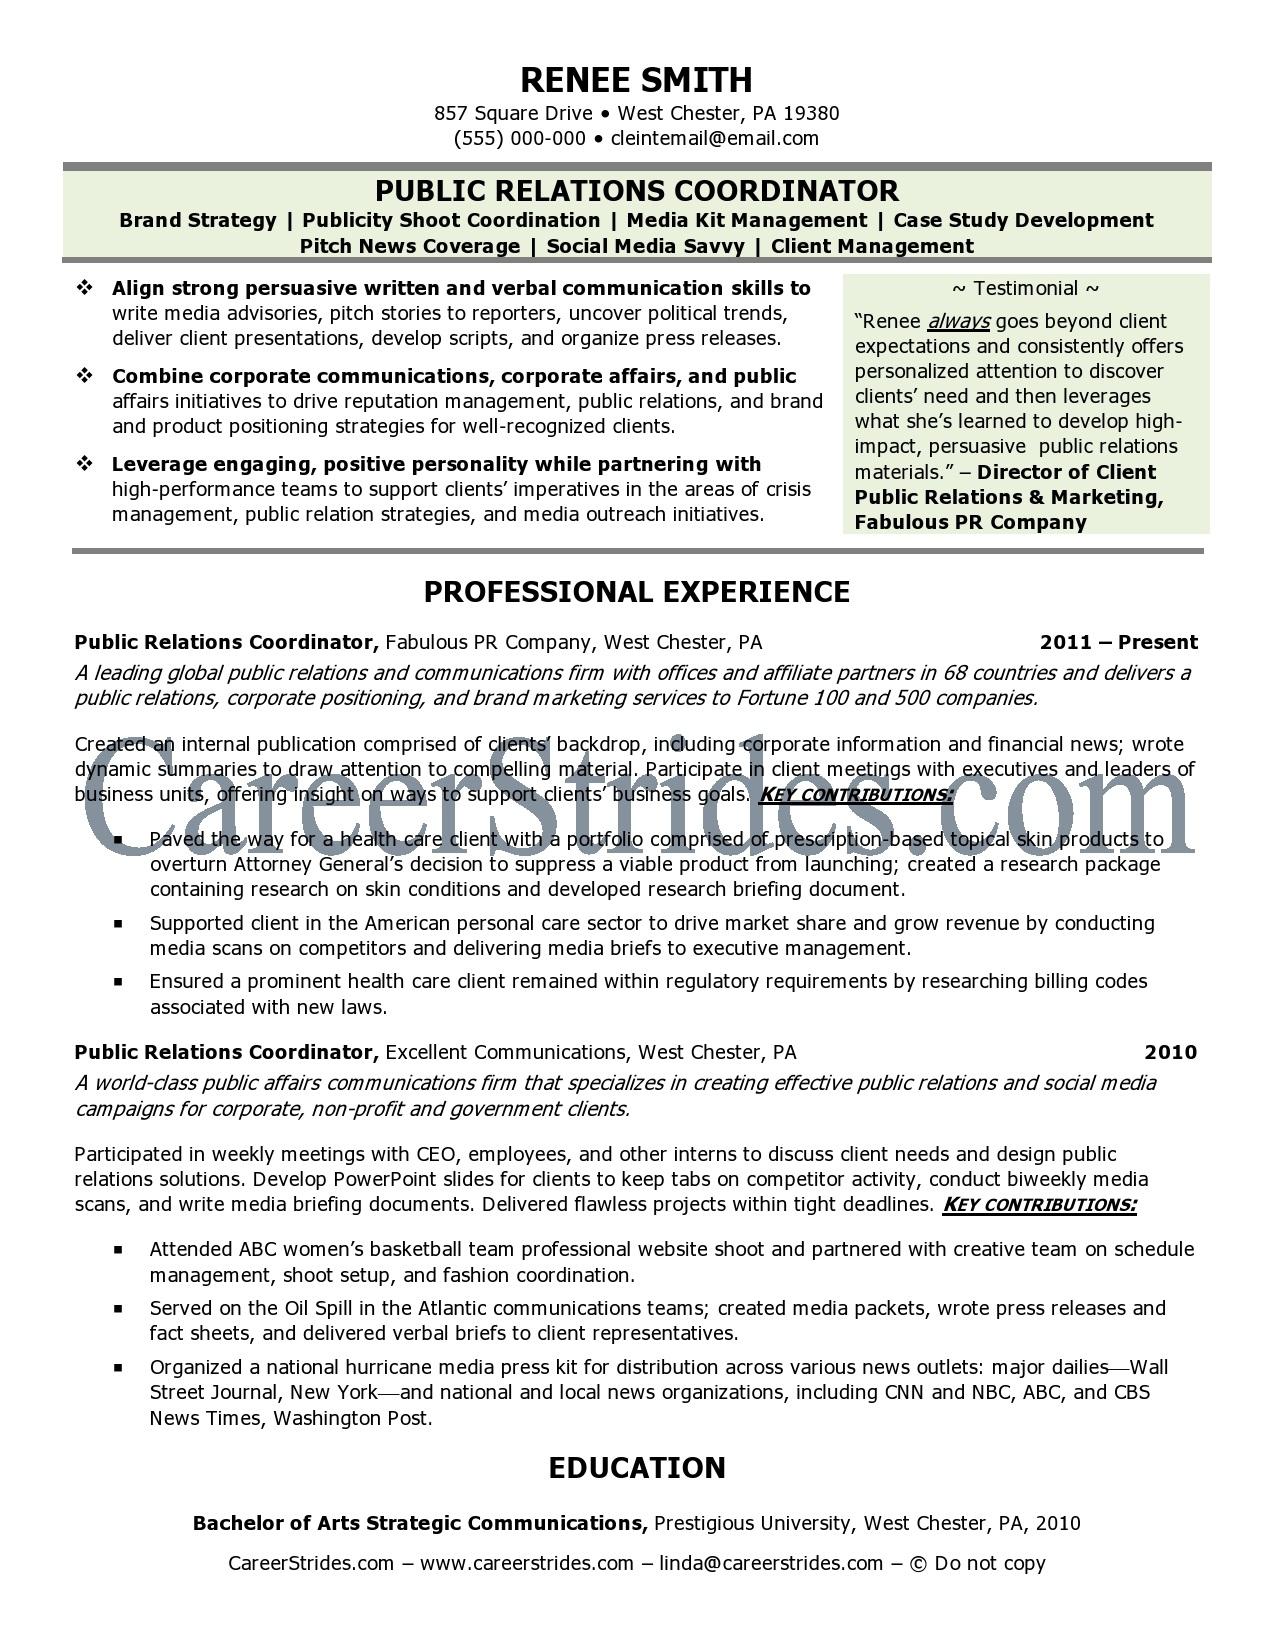 public relations specialist resume samples singlepageresume com jpg pr resume template